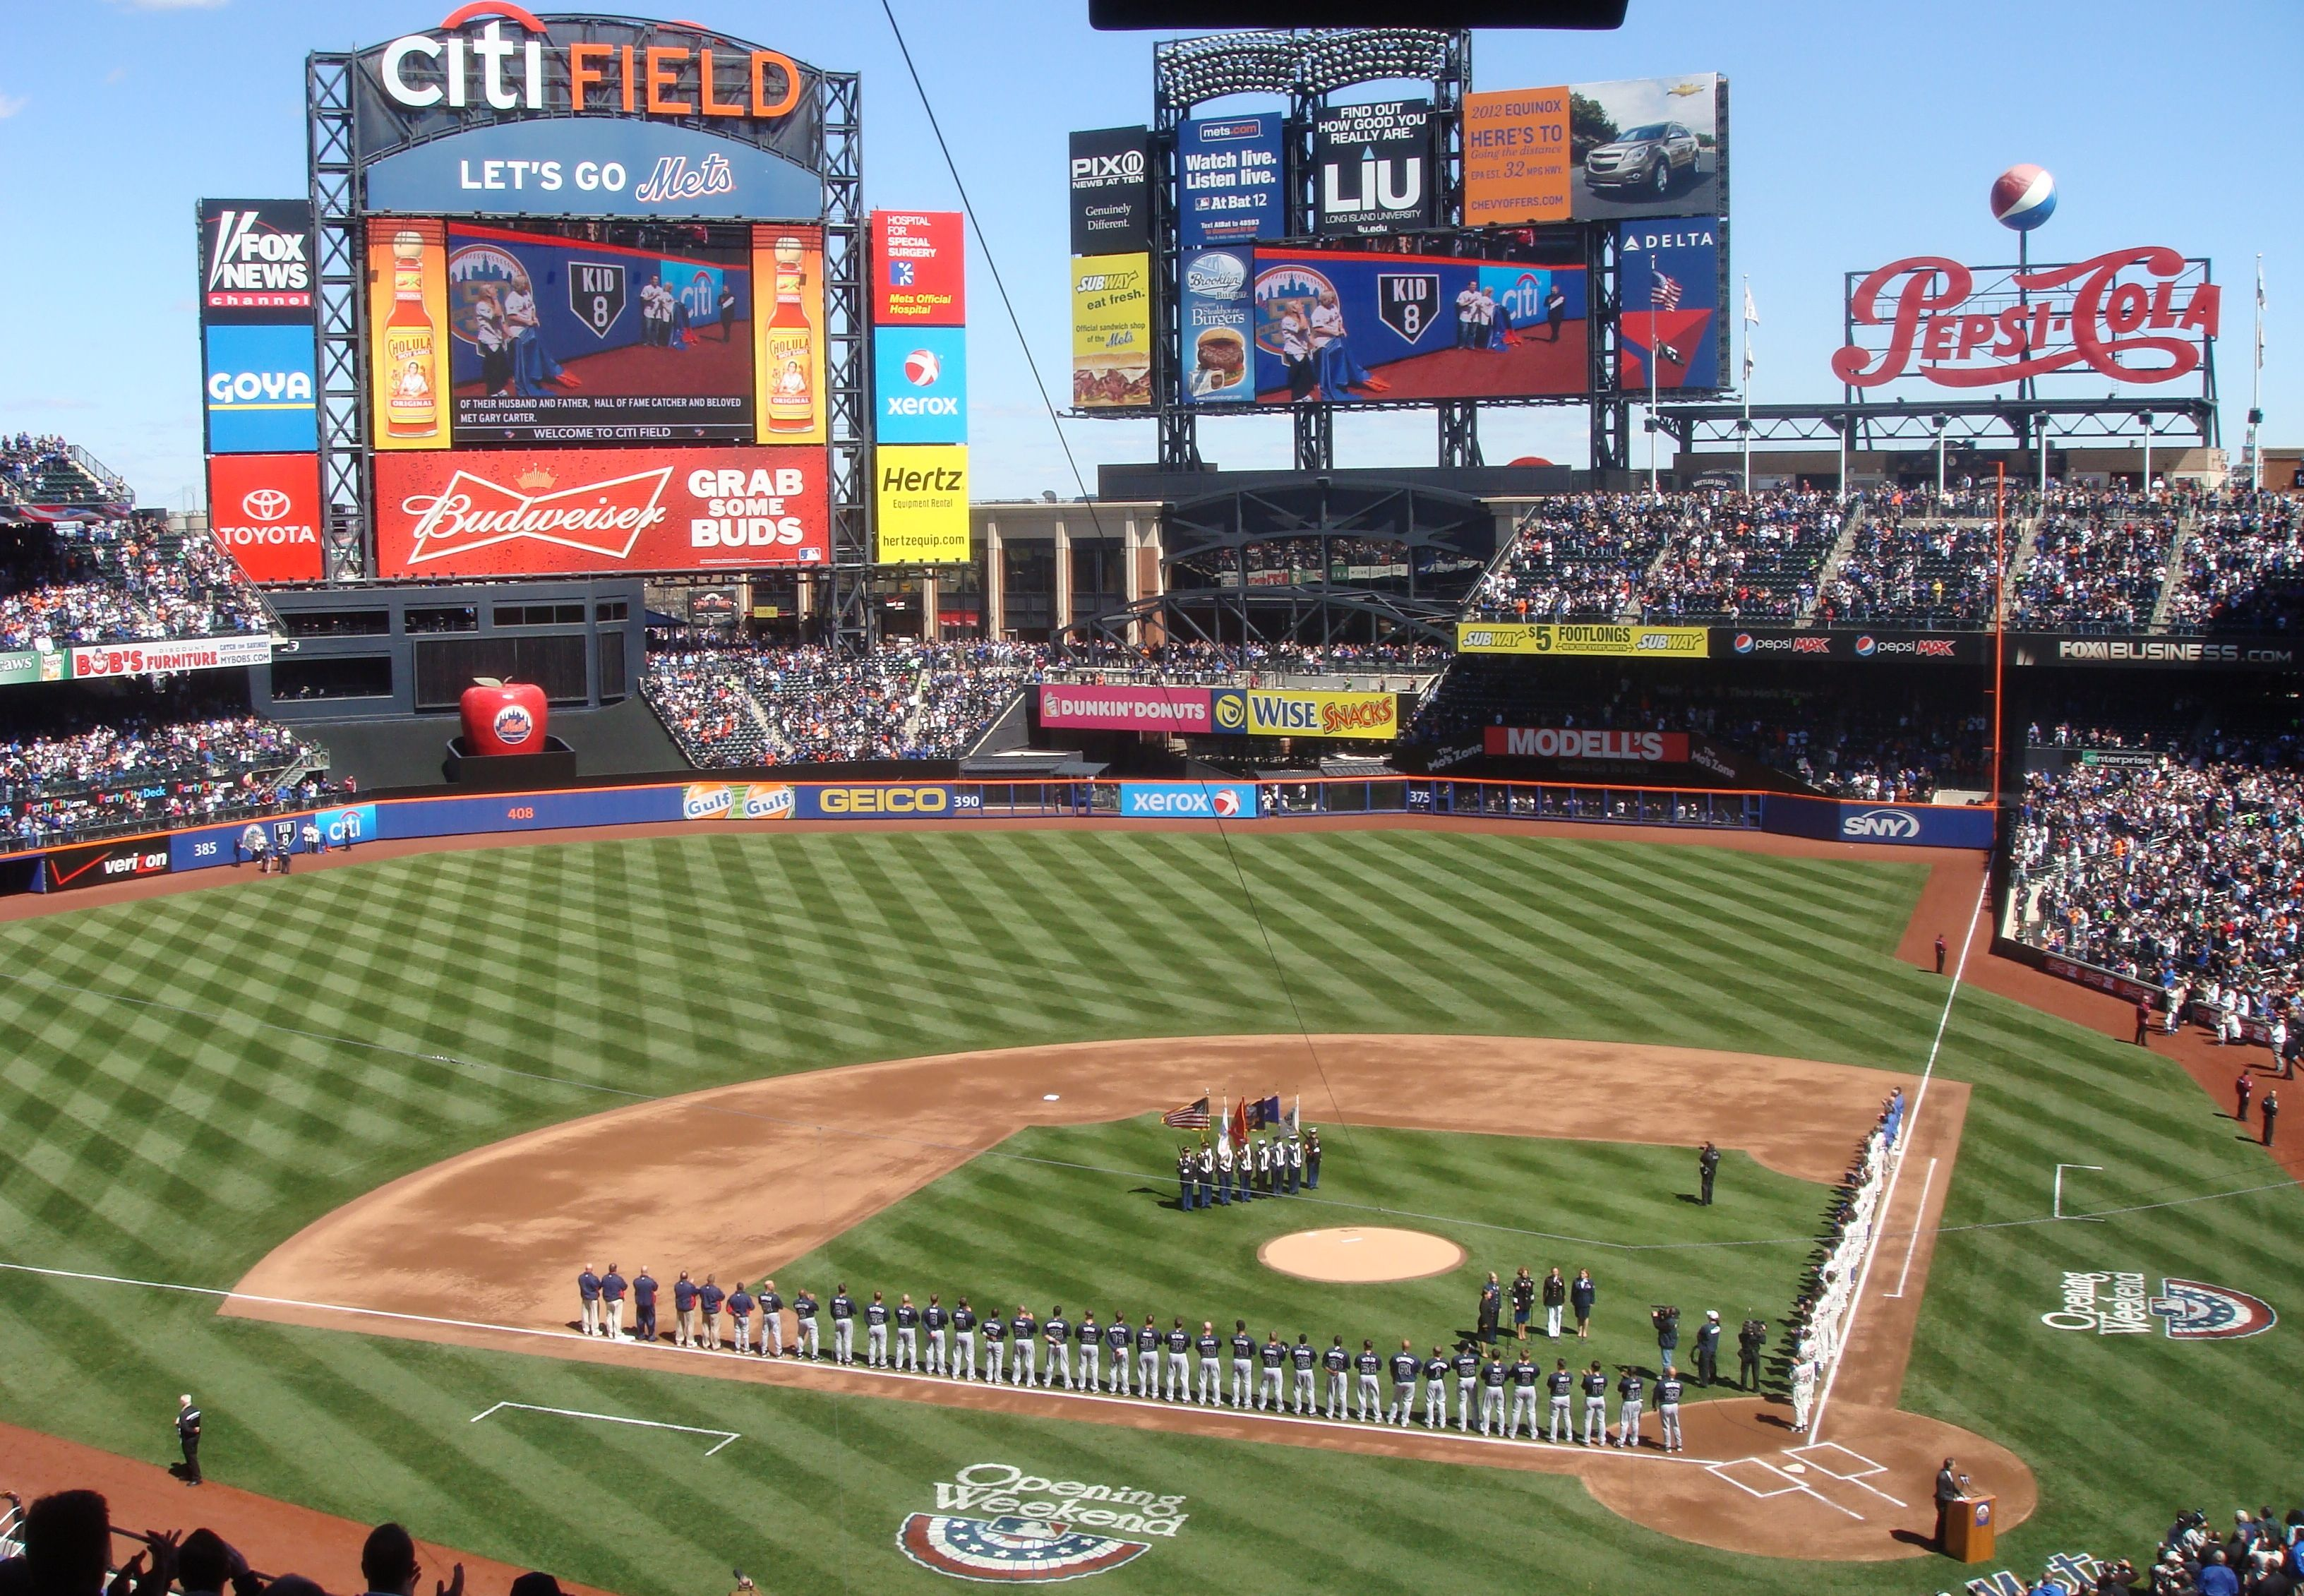 New york mets citi field hd mlb baseball pinterest explore wallpaper gallery hd wallpaper and more new york mets citi field altavistaventures Images